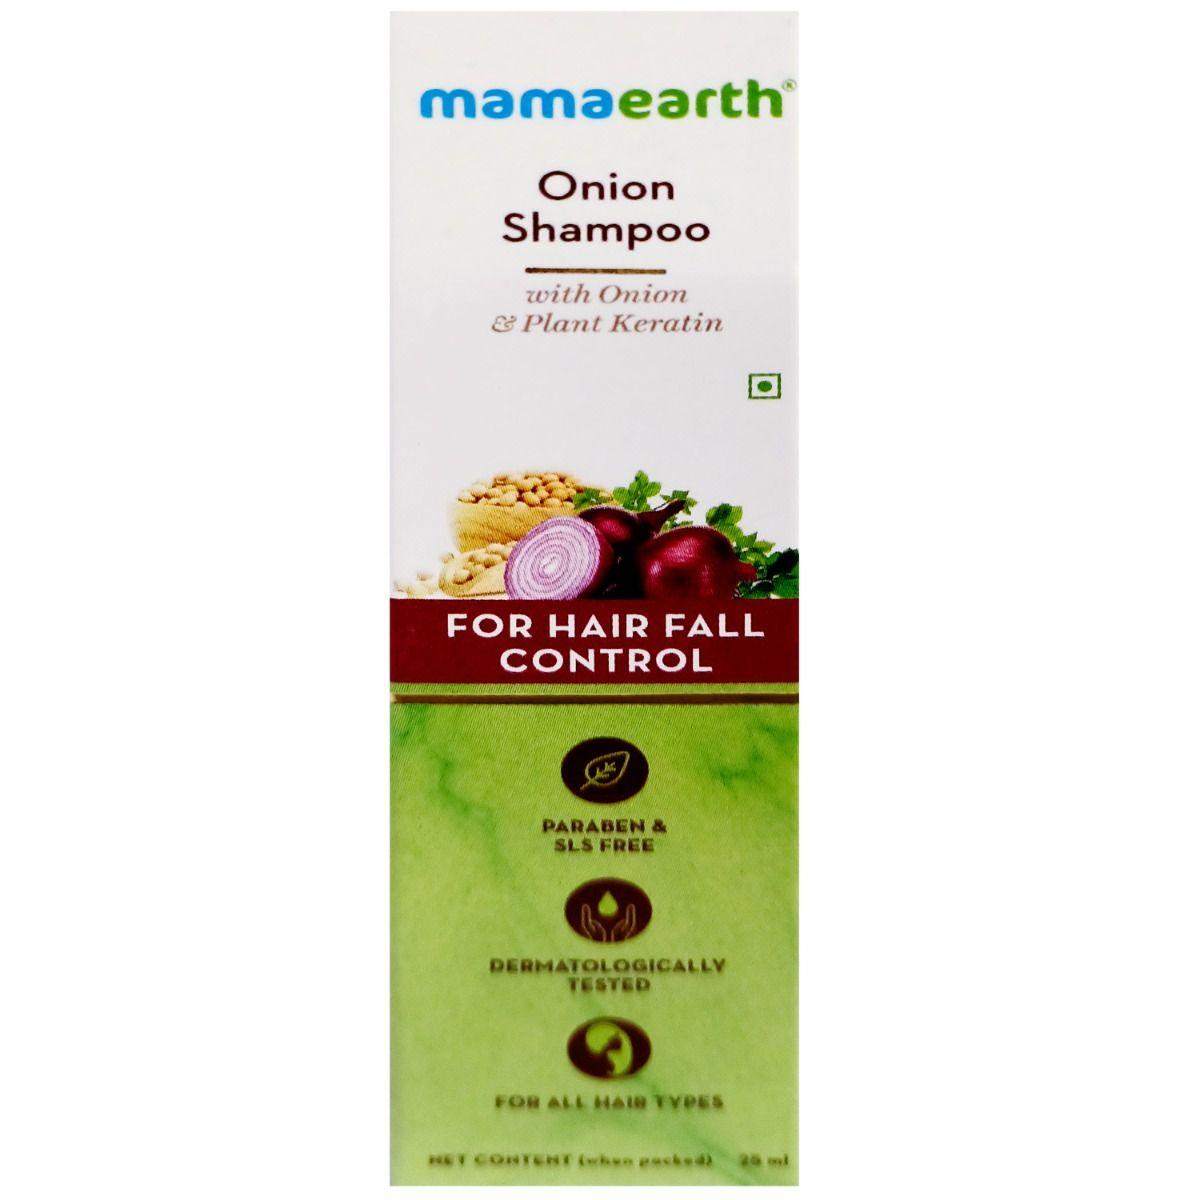 Mamaearth Onion Shampoo For Hair Fall Control, 25 ml